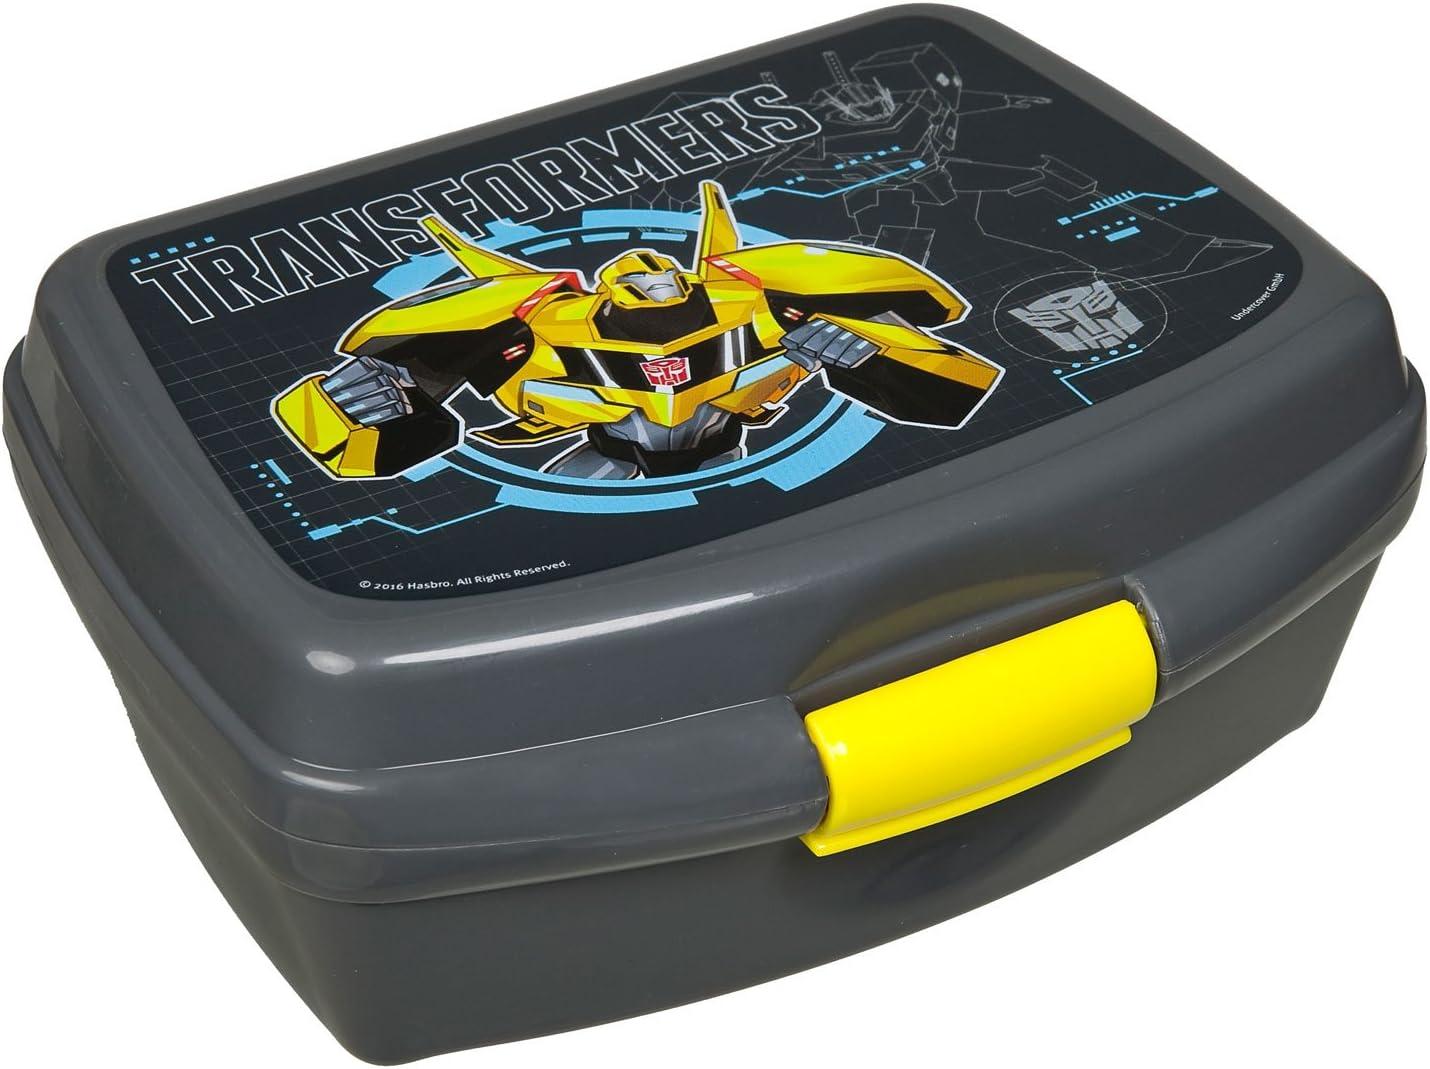 /Amis Livre A5 Undercover tfuv0962/ Transformers